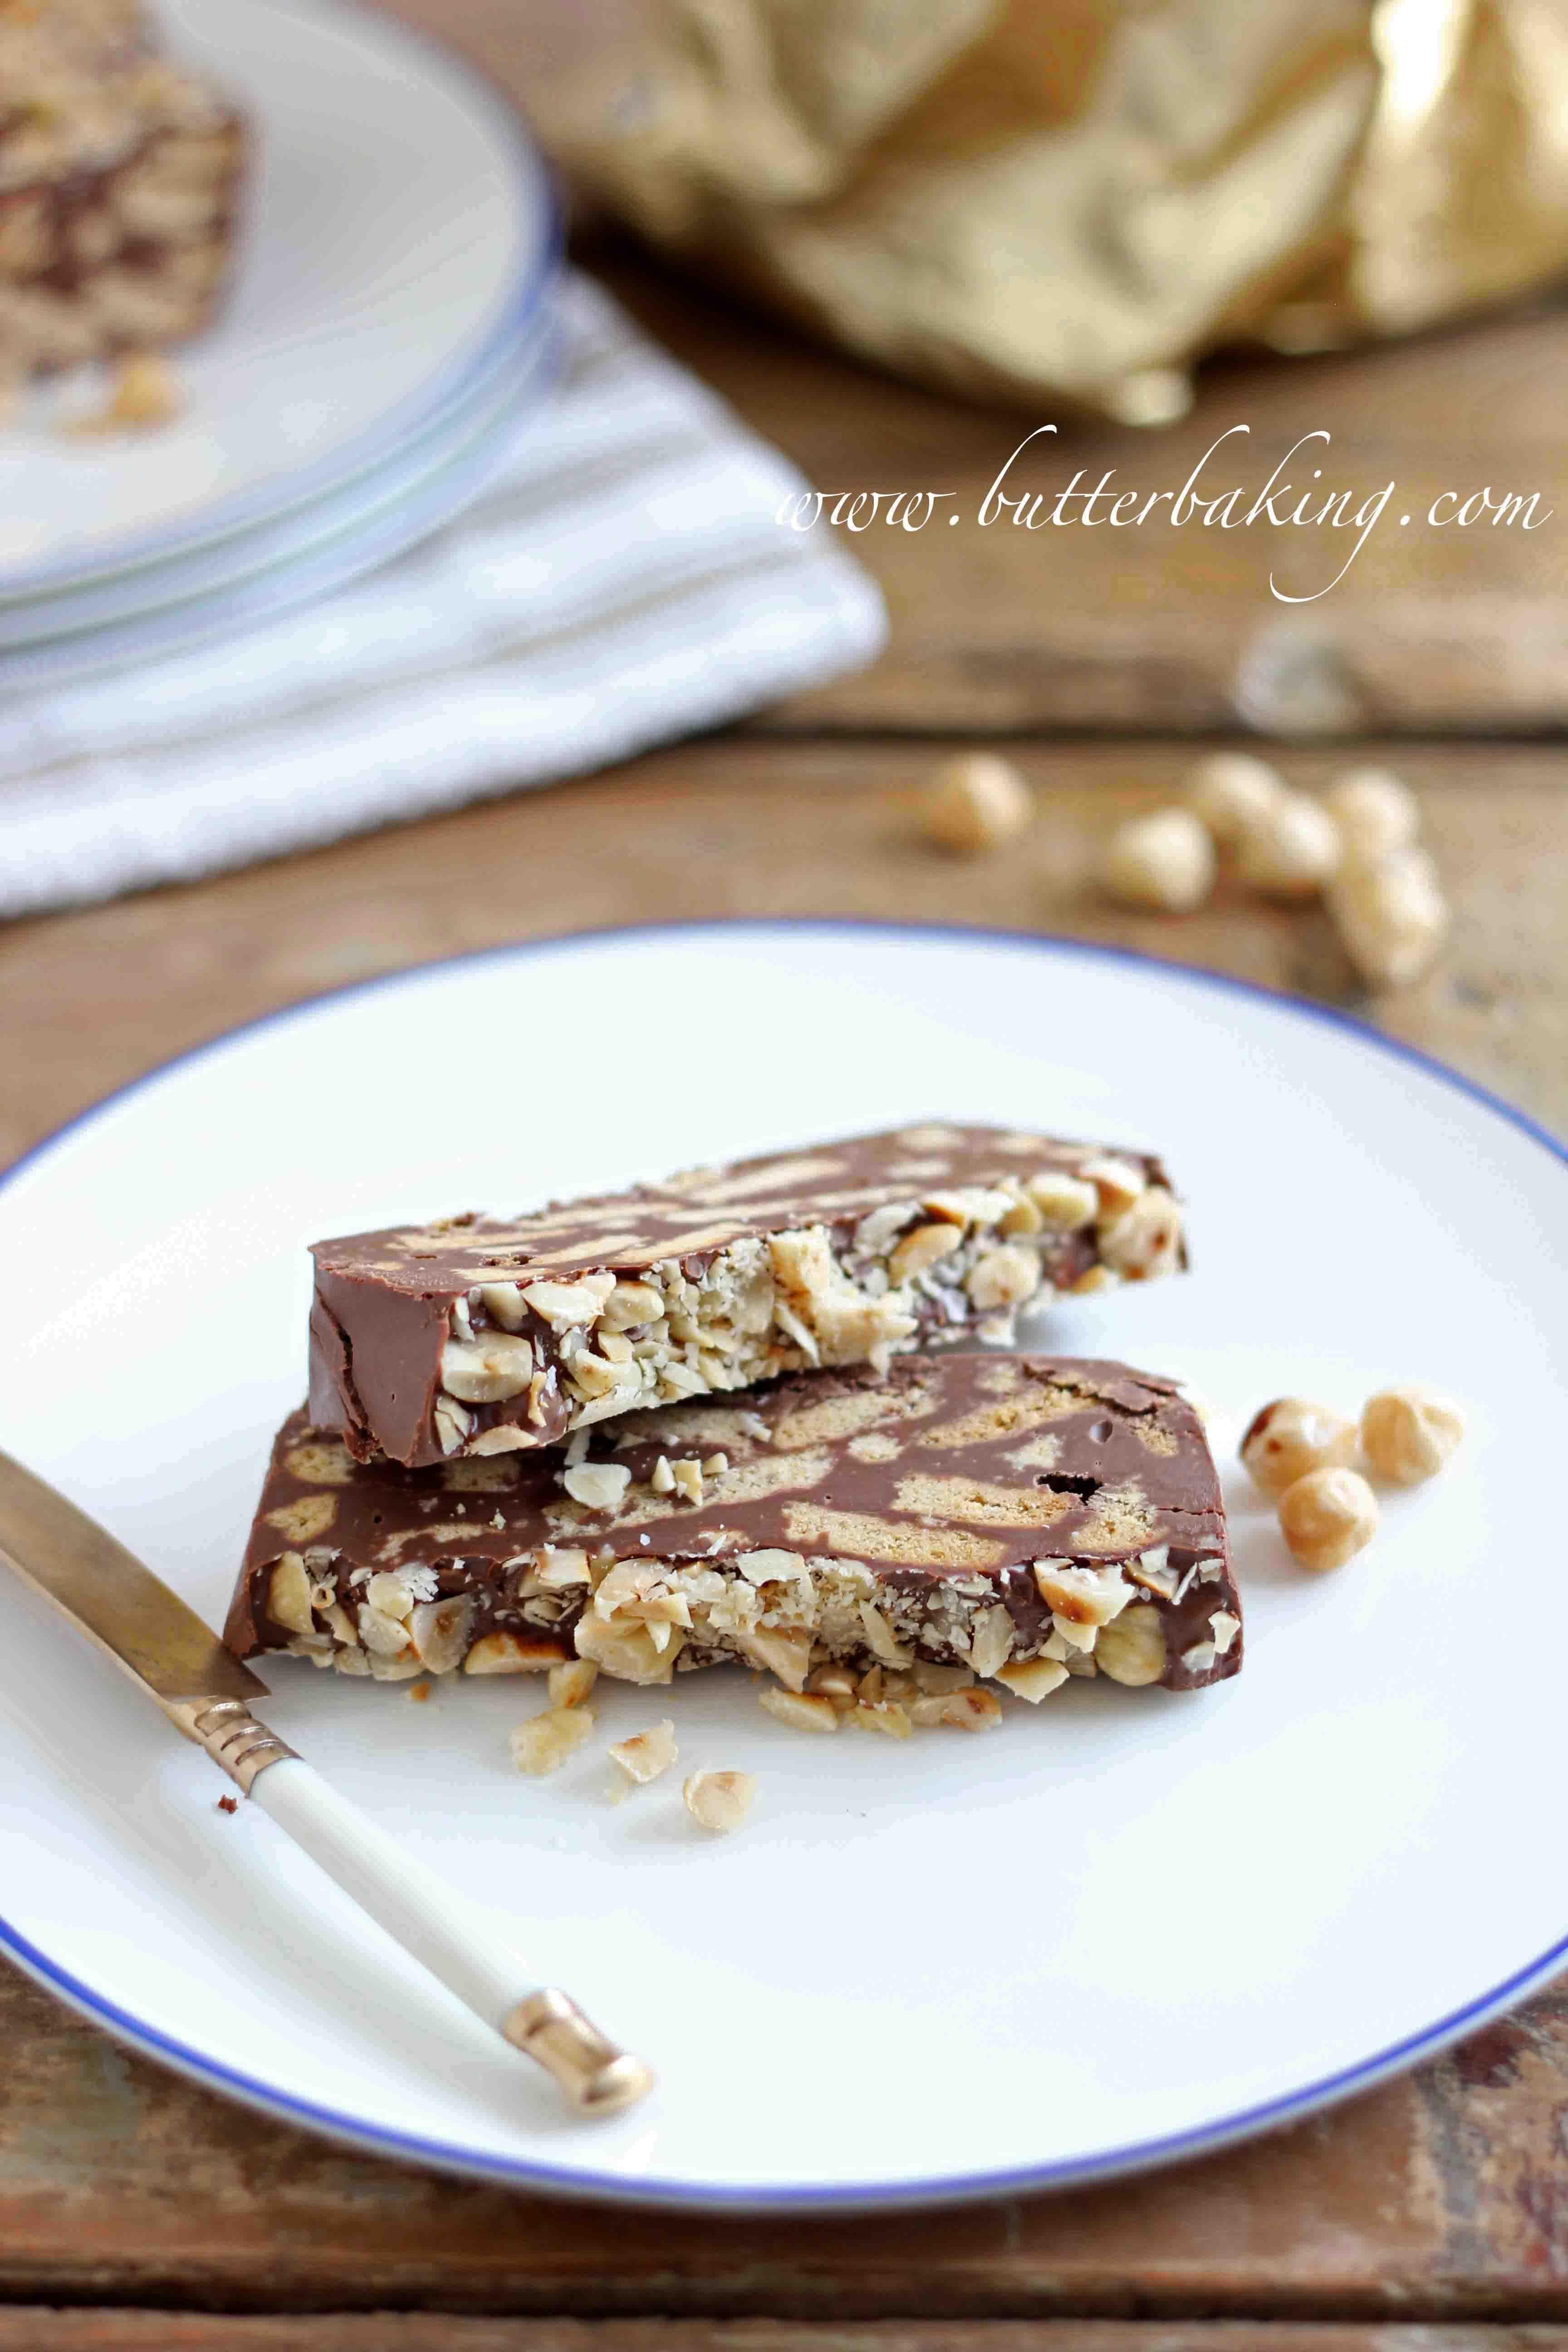 Chocolate Hazelnut Biscuit Cake – Butter Baking